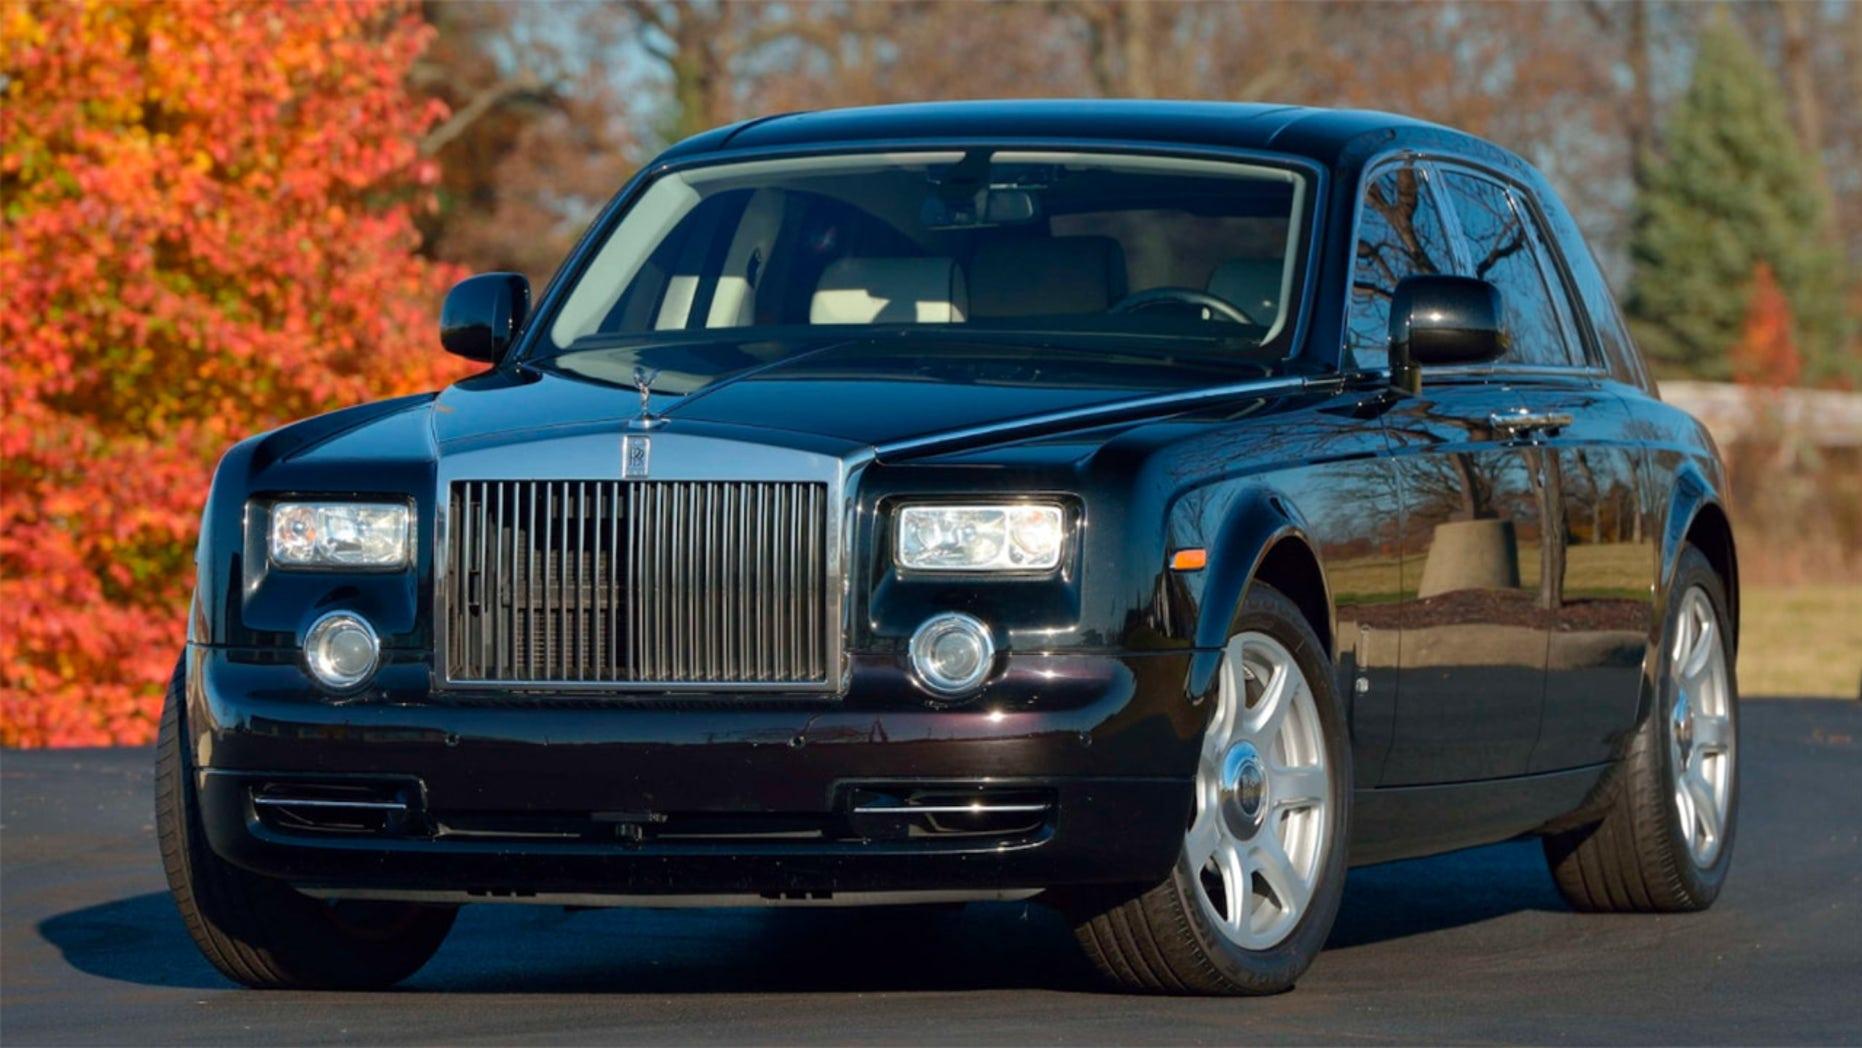 Trump's old Ferrari and Rolls-Royce